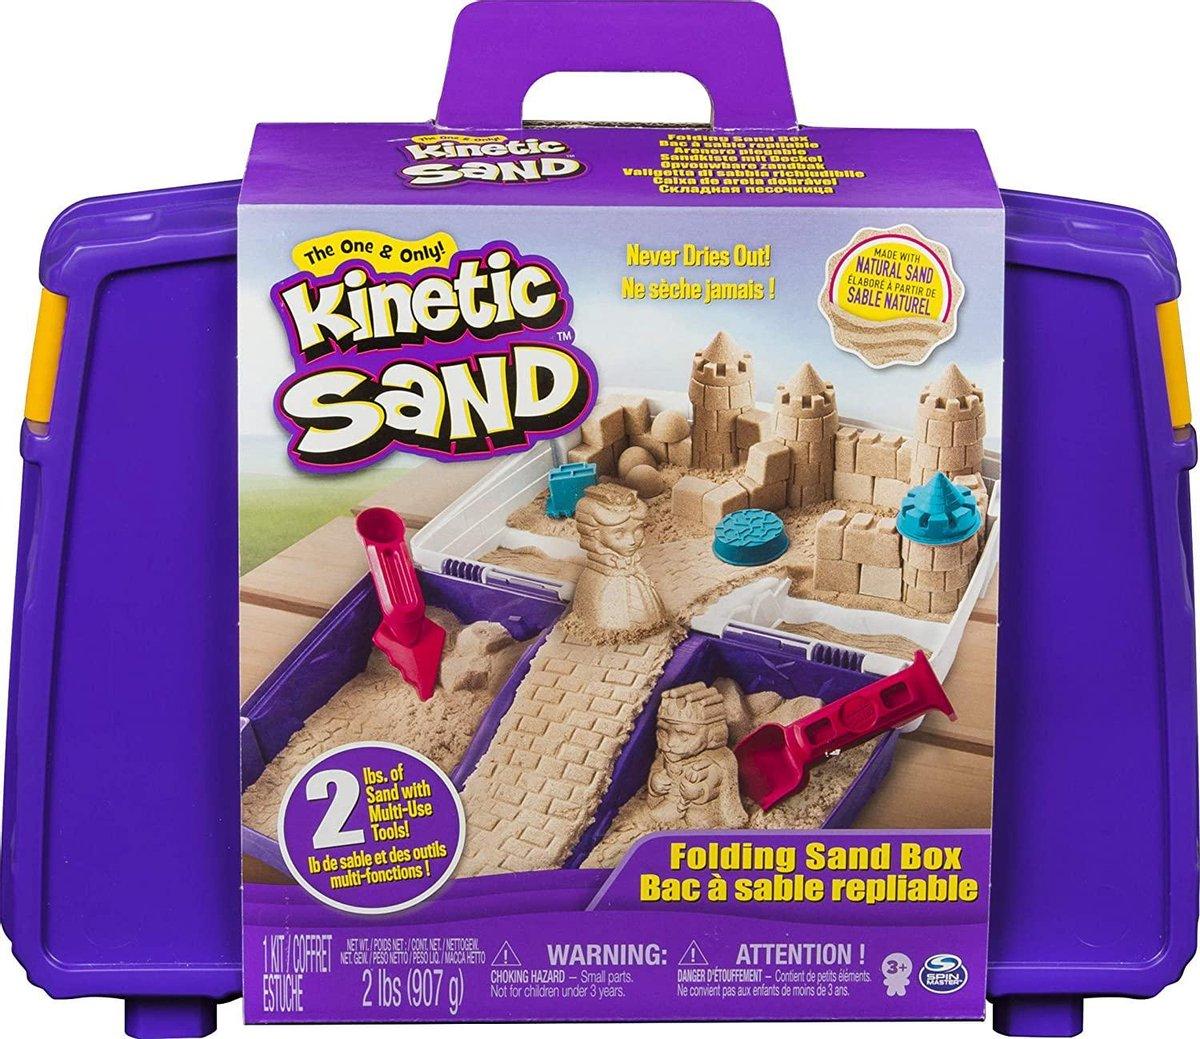 Kinetic Sand zand speelkoffer met 907 g zand, 5 vormpjes en 2 gereedschappen